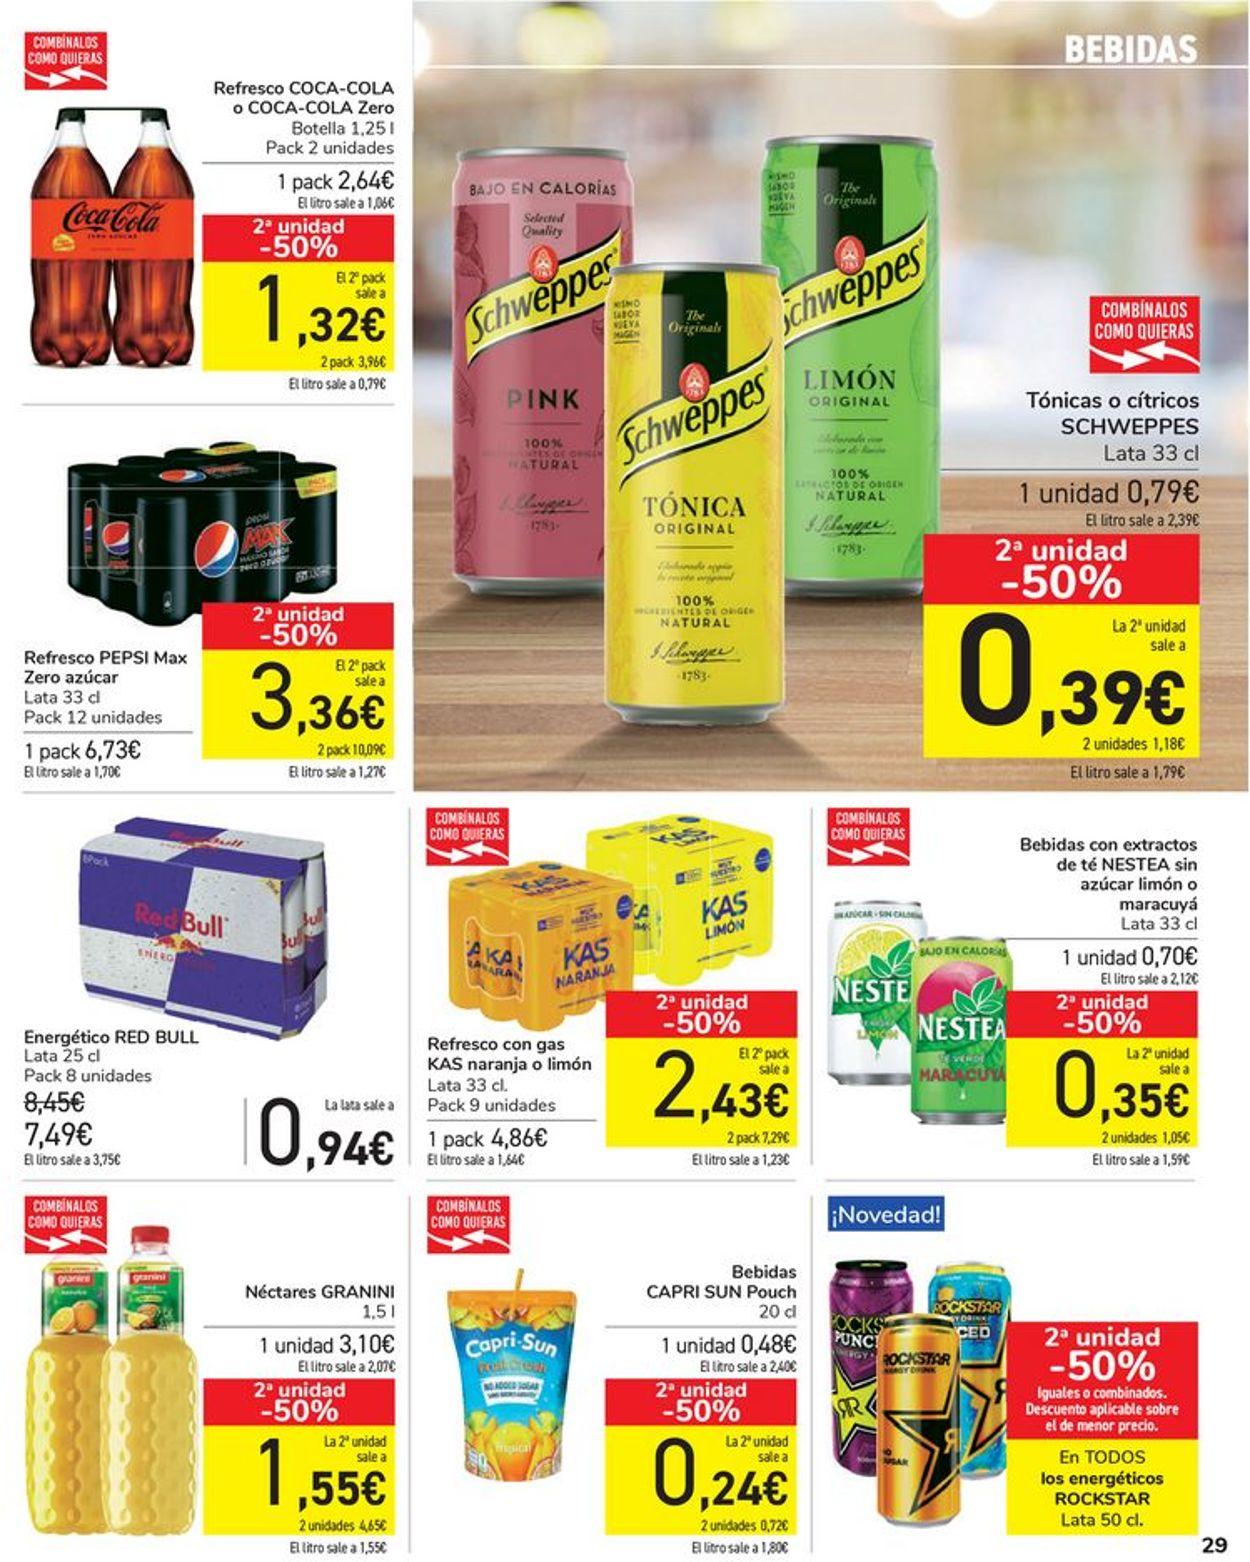 Carrefour Folleto - 08.06-16.06.2021 (Página 29)